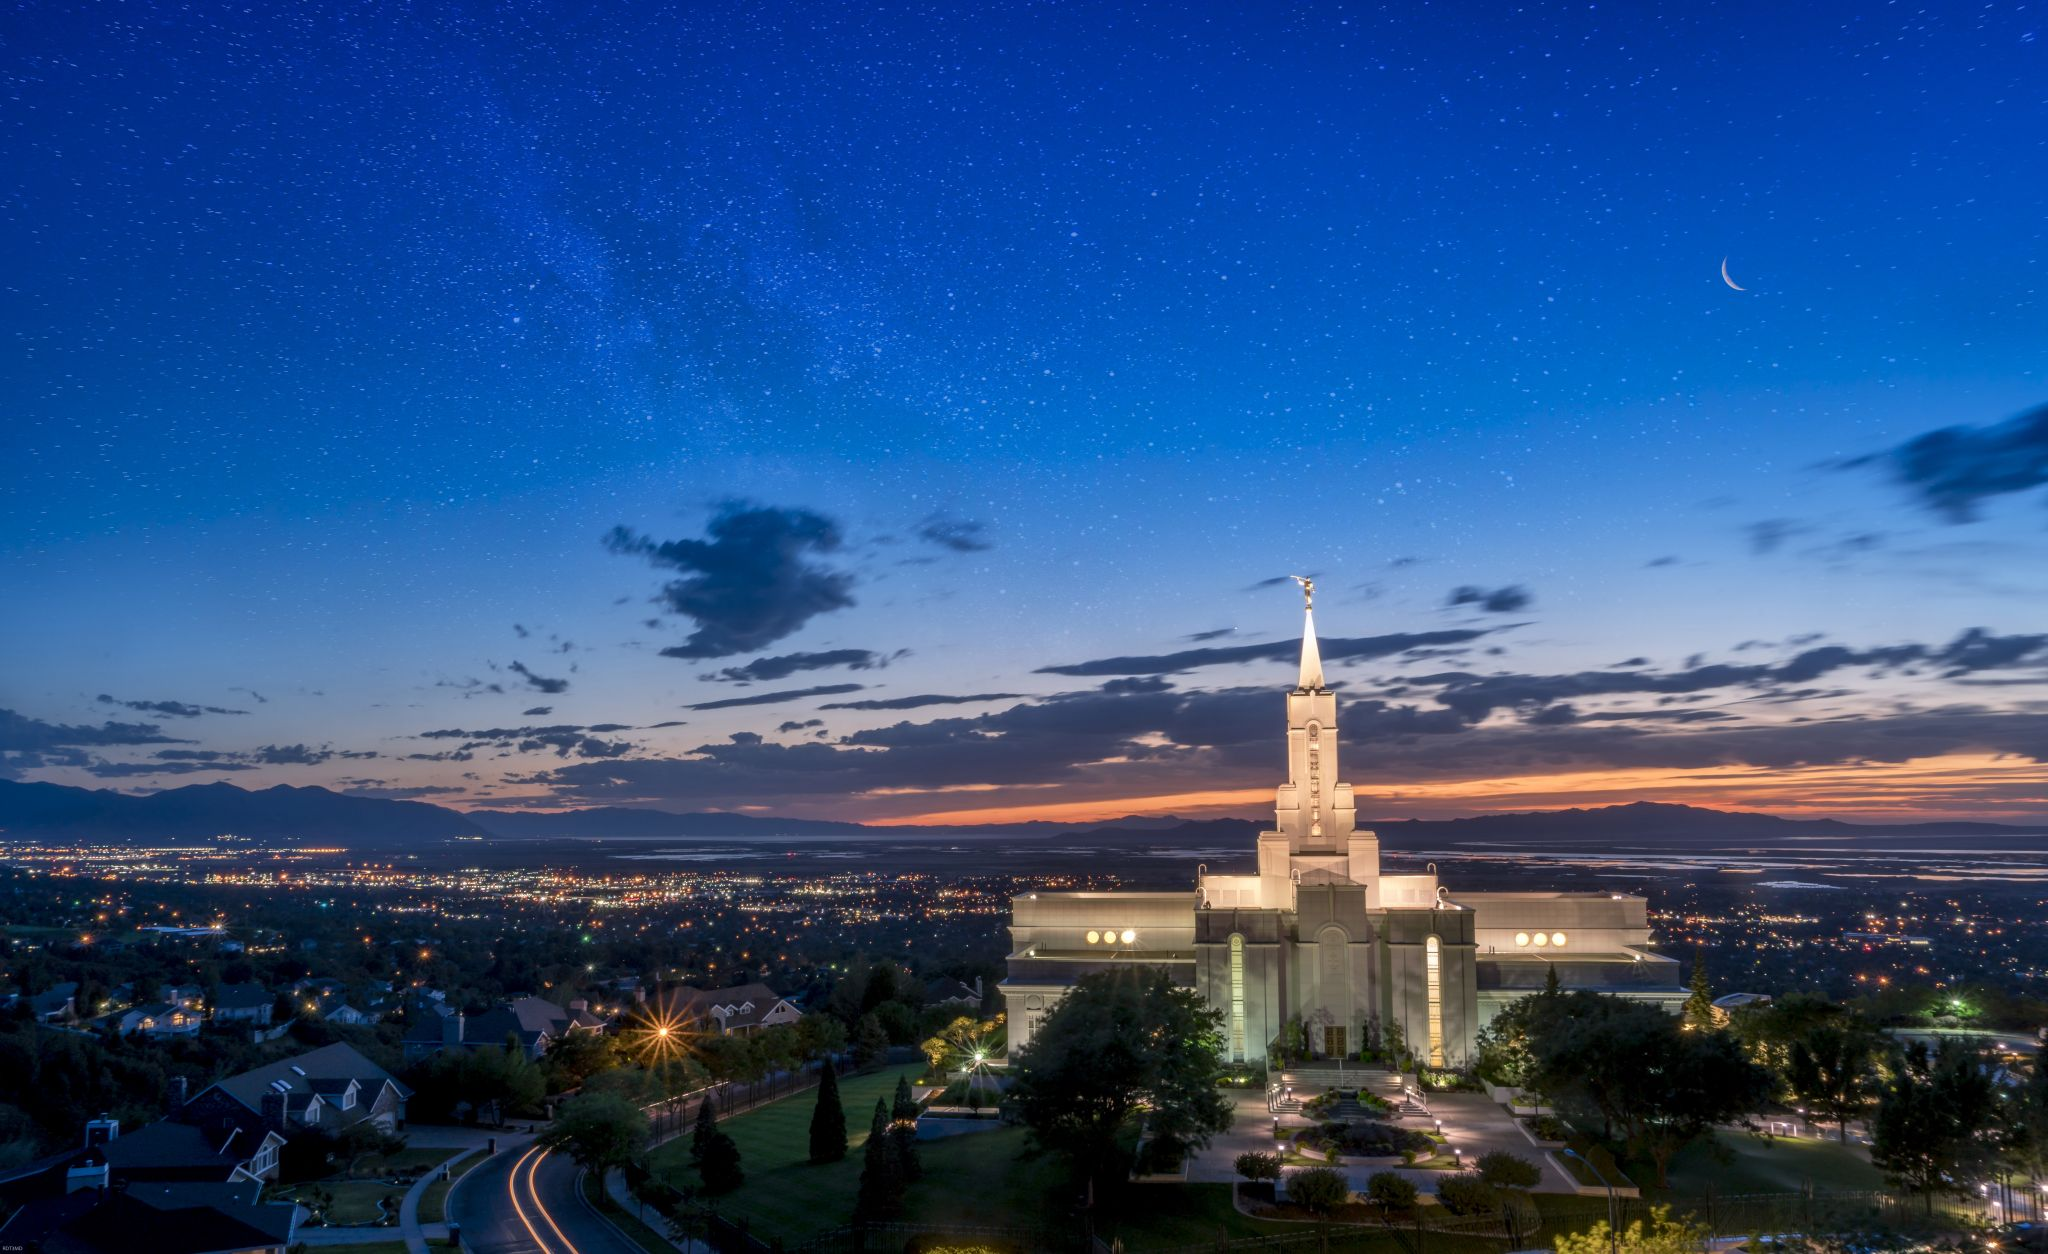 Bountiful LDS Temple, USA